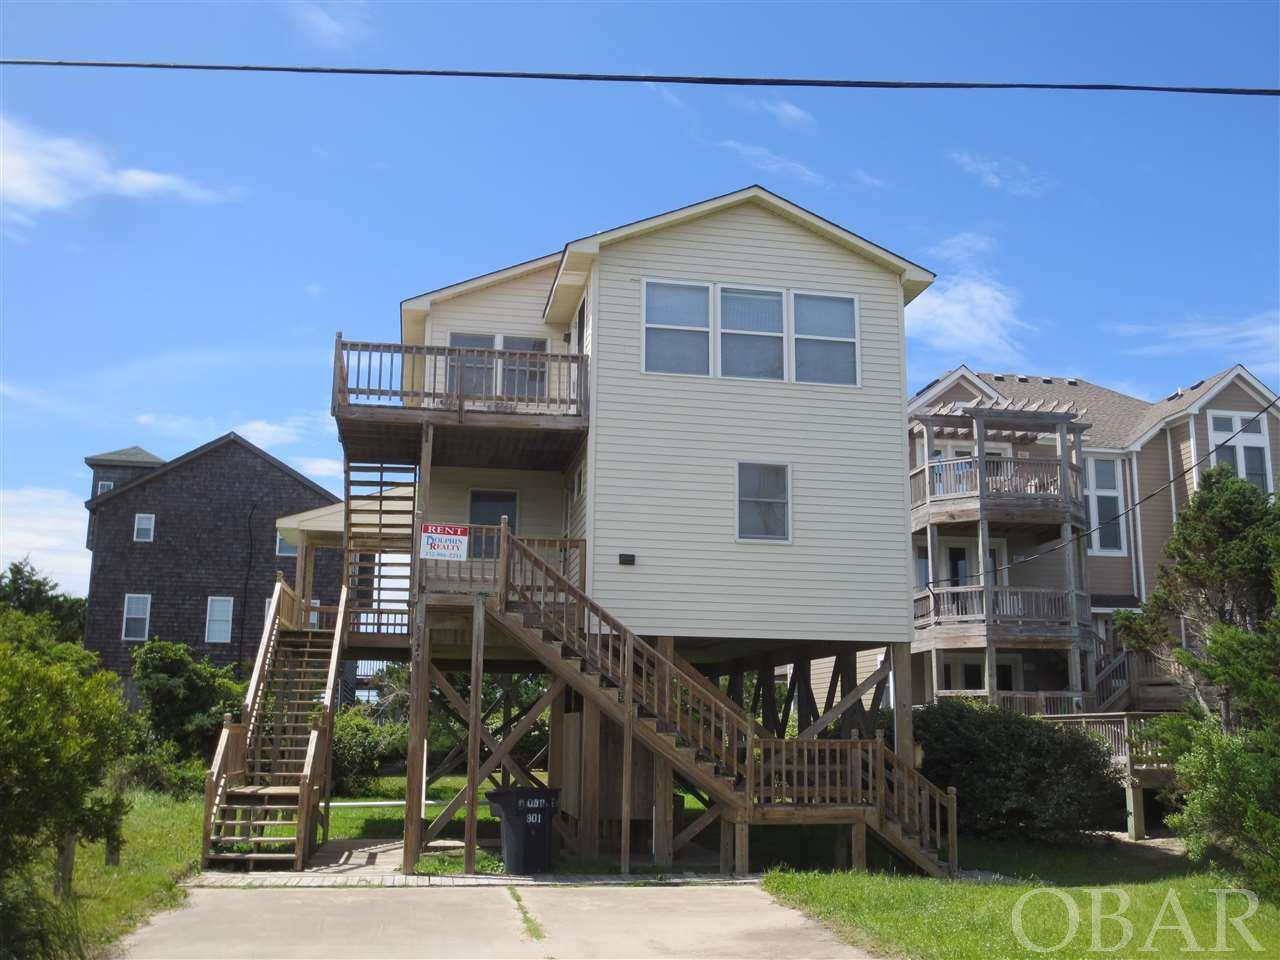 54209 Shoresurf Lane Lot 6, Frisco, NC 27936